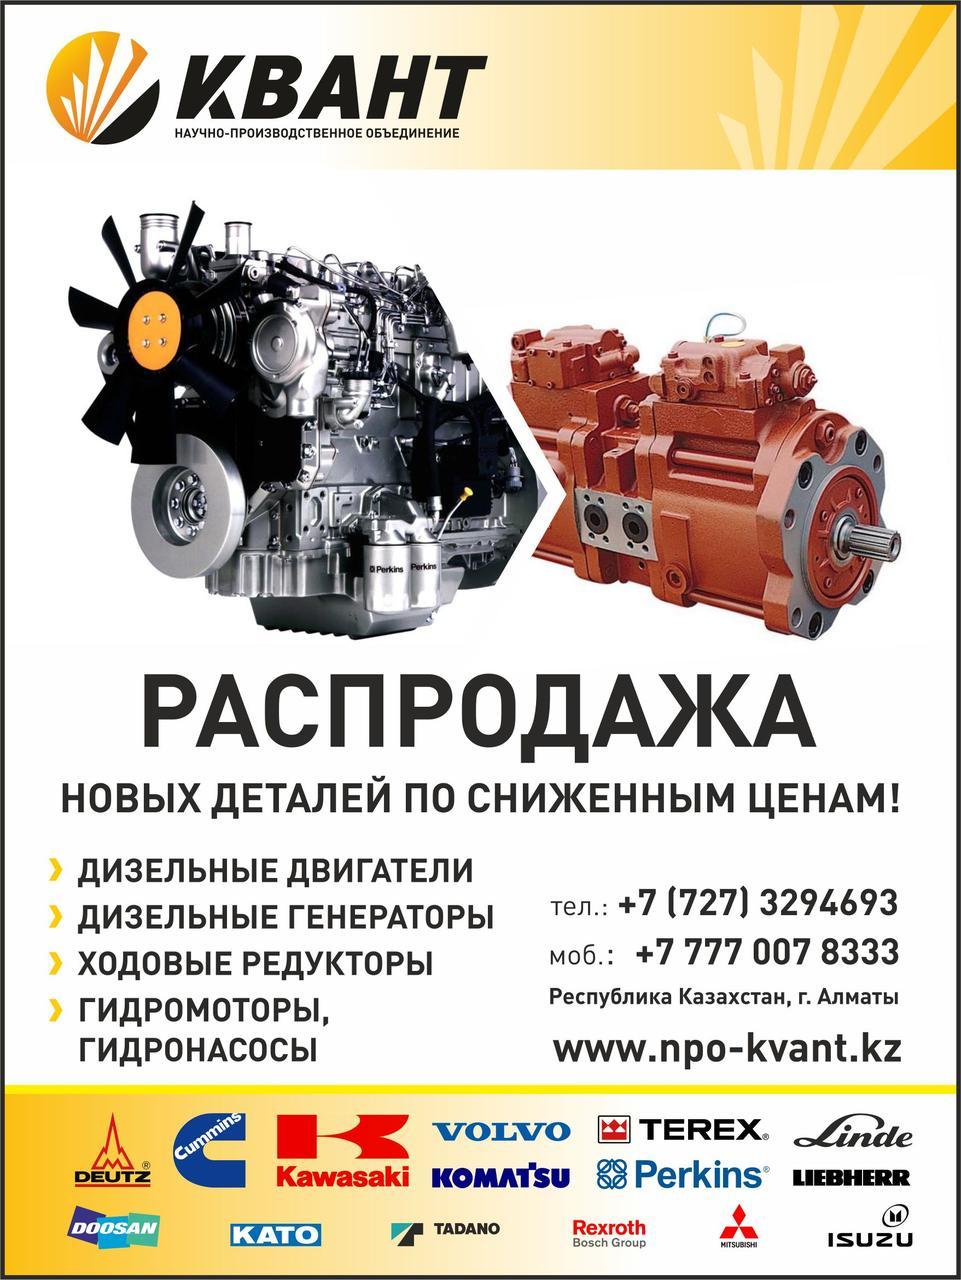 Двигатель Iveco F4CE9684N, Iveco F4CE0304A*D600, Iveco F4CE0404C, Iveco F4CE0404D, Iveco F4CE0404E